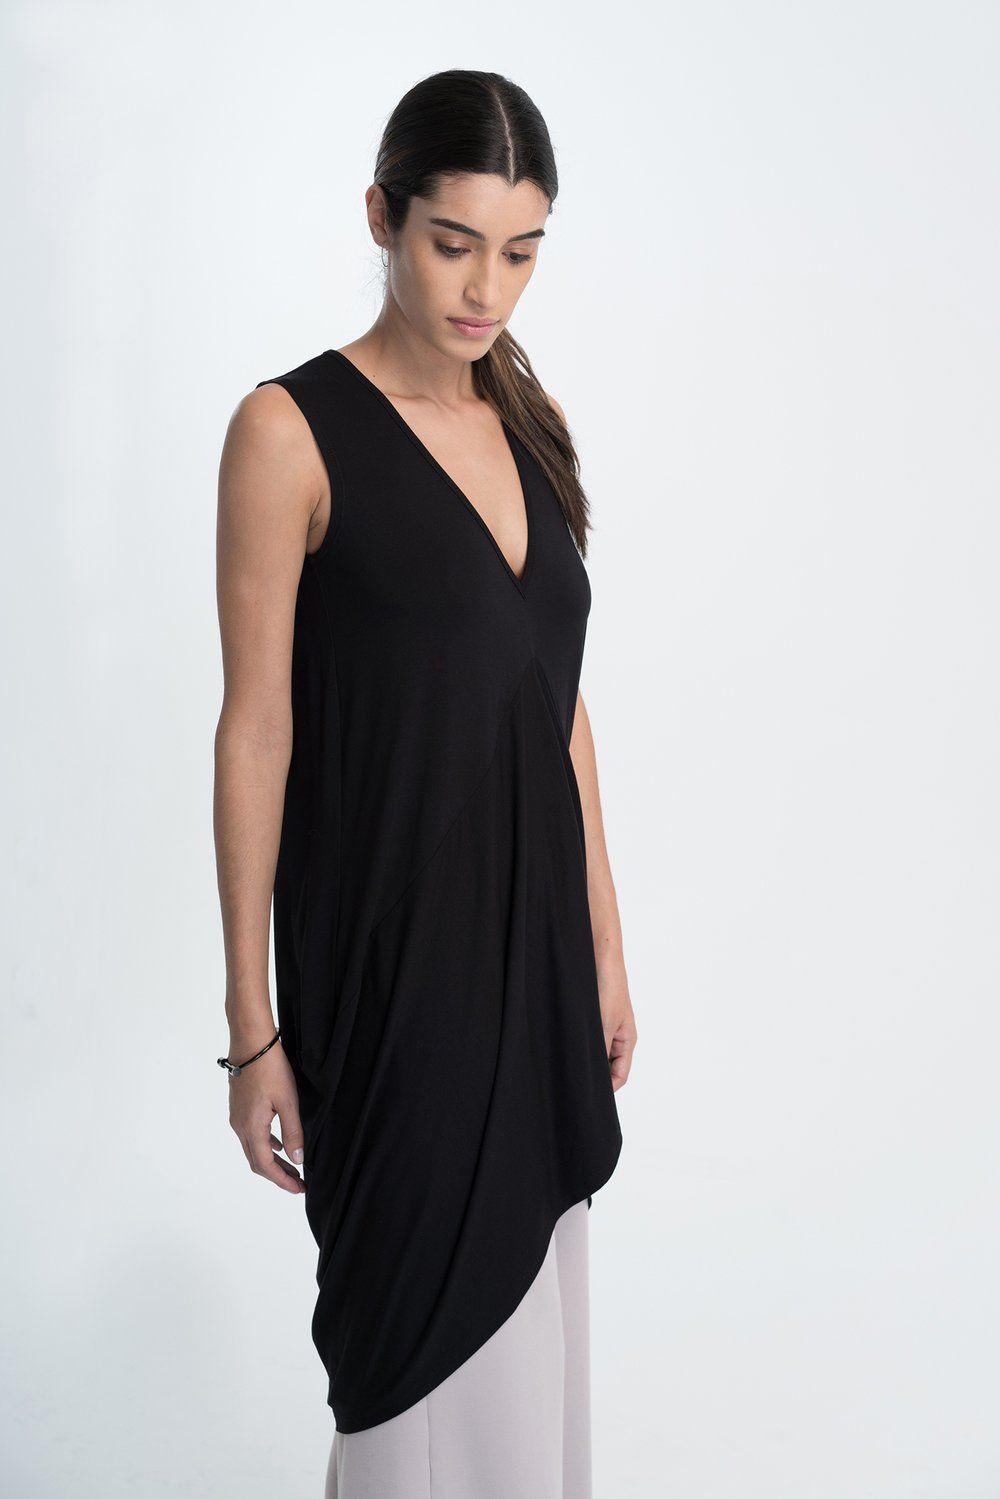 58a1303401 Women s Clothing